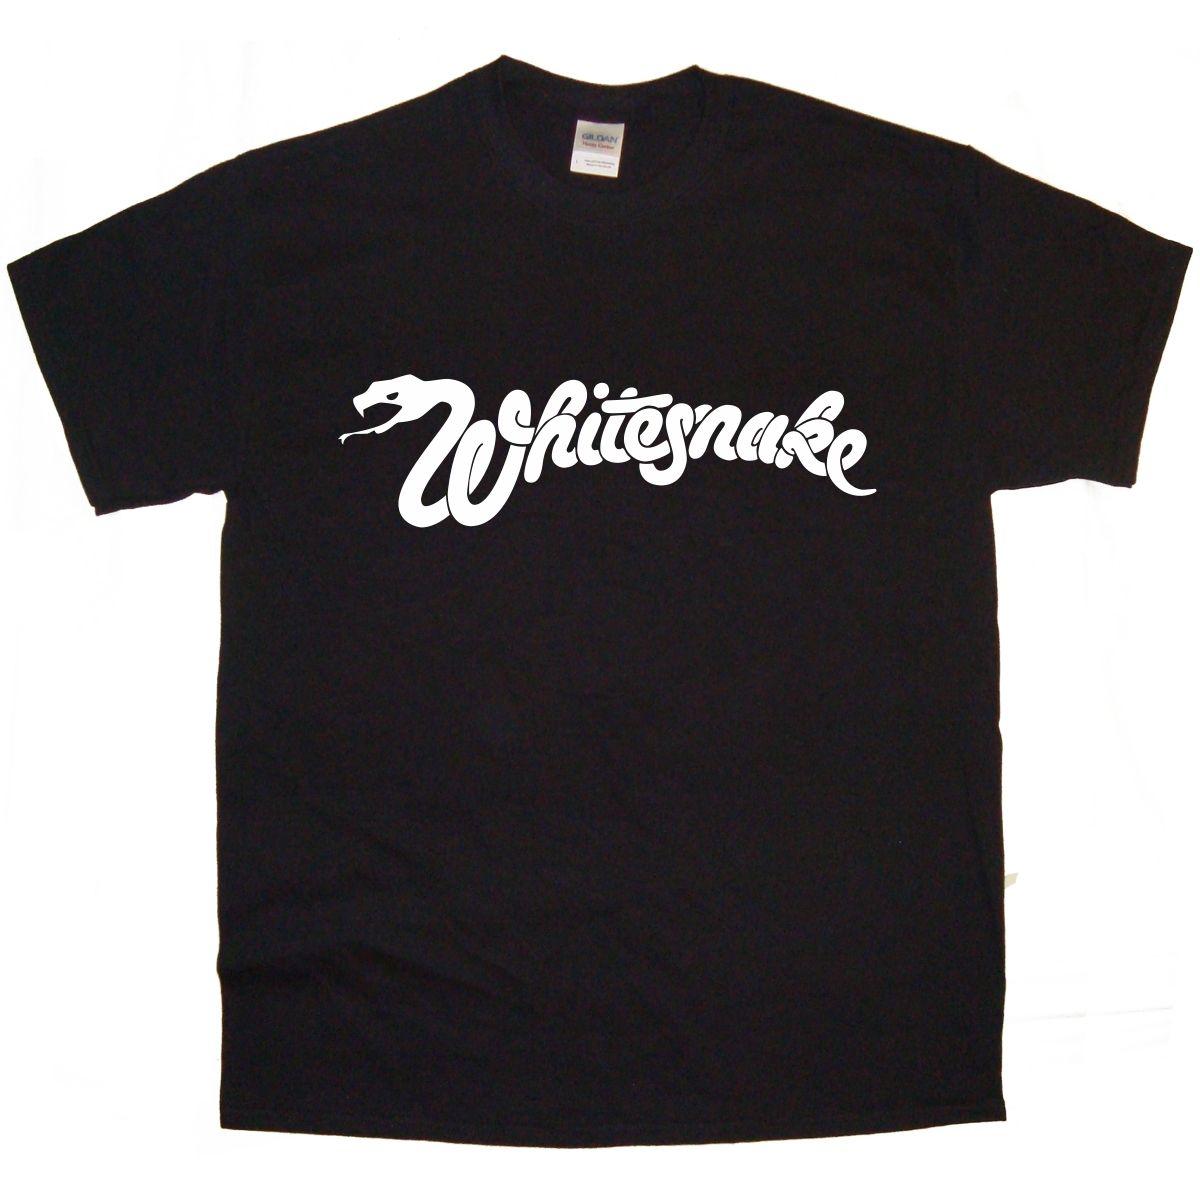 T shirt whitesnake - Whitesnake Band Logo Rock Thrash Black Heavy Metal Punk Pop T Shirt Tee